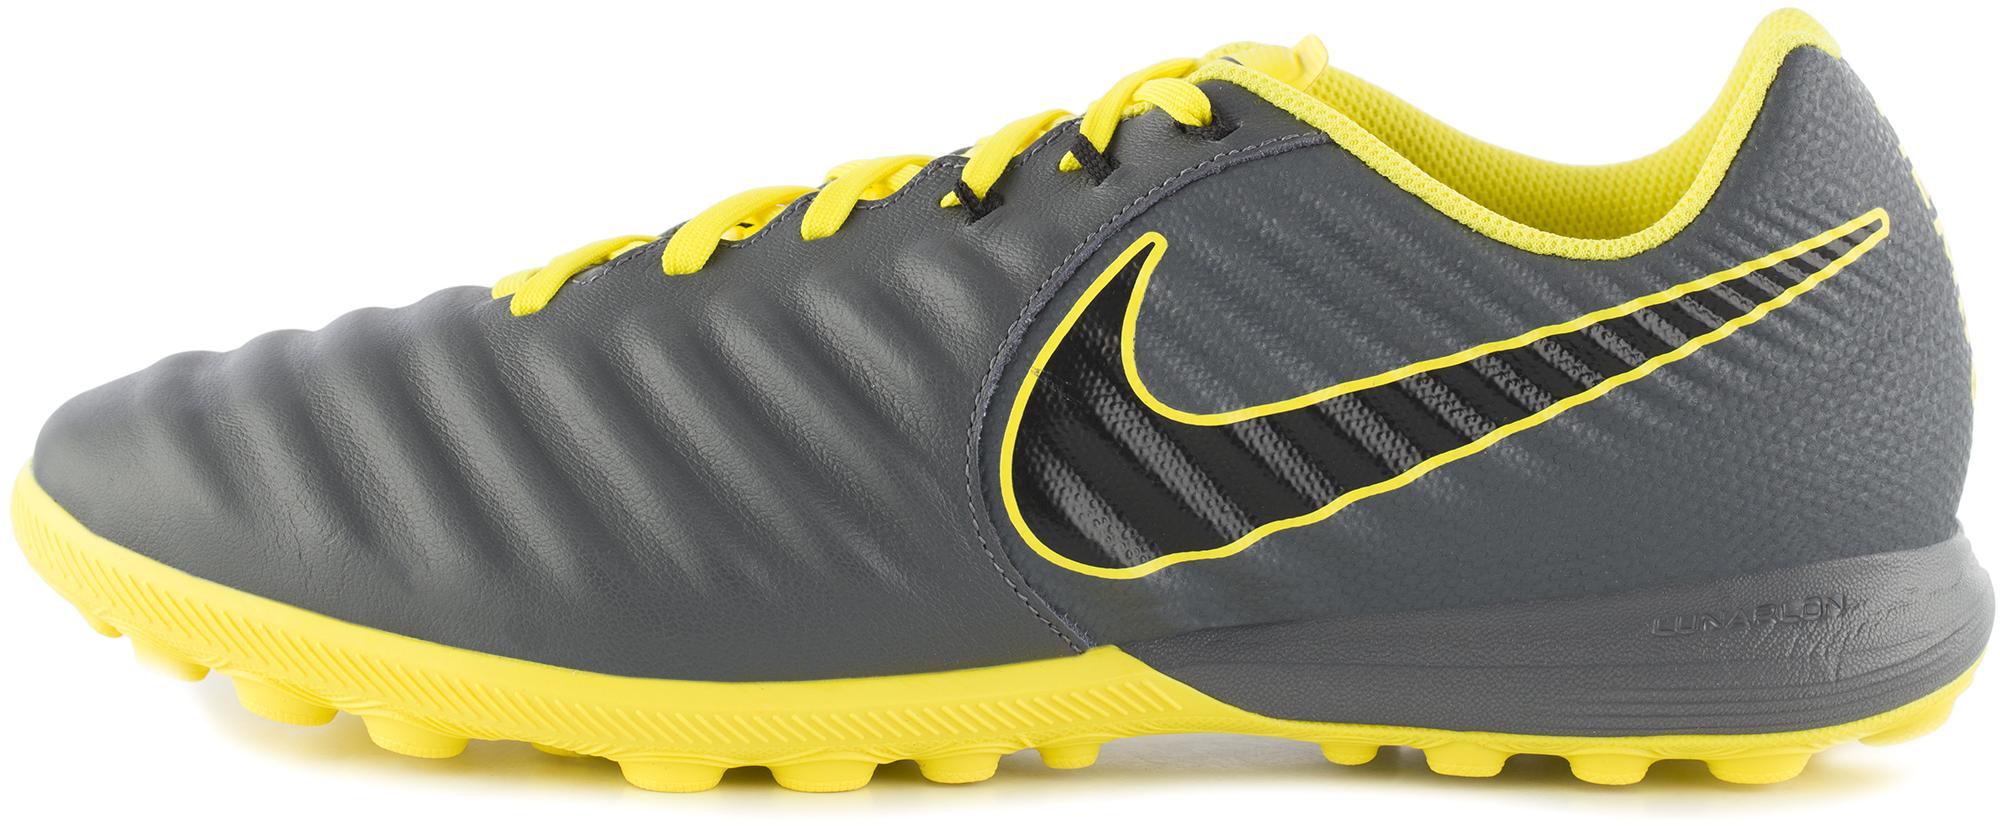 Nike Бутсы мужские Nike Tiempo Lunar Legend 7 Pro TF, размер 41,5 цена 2017